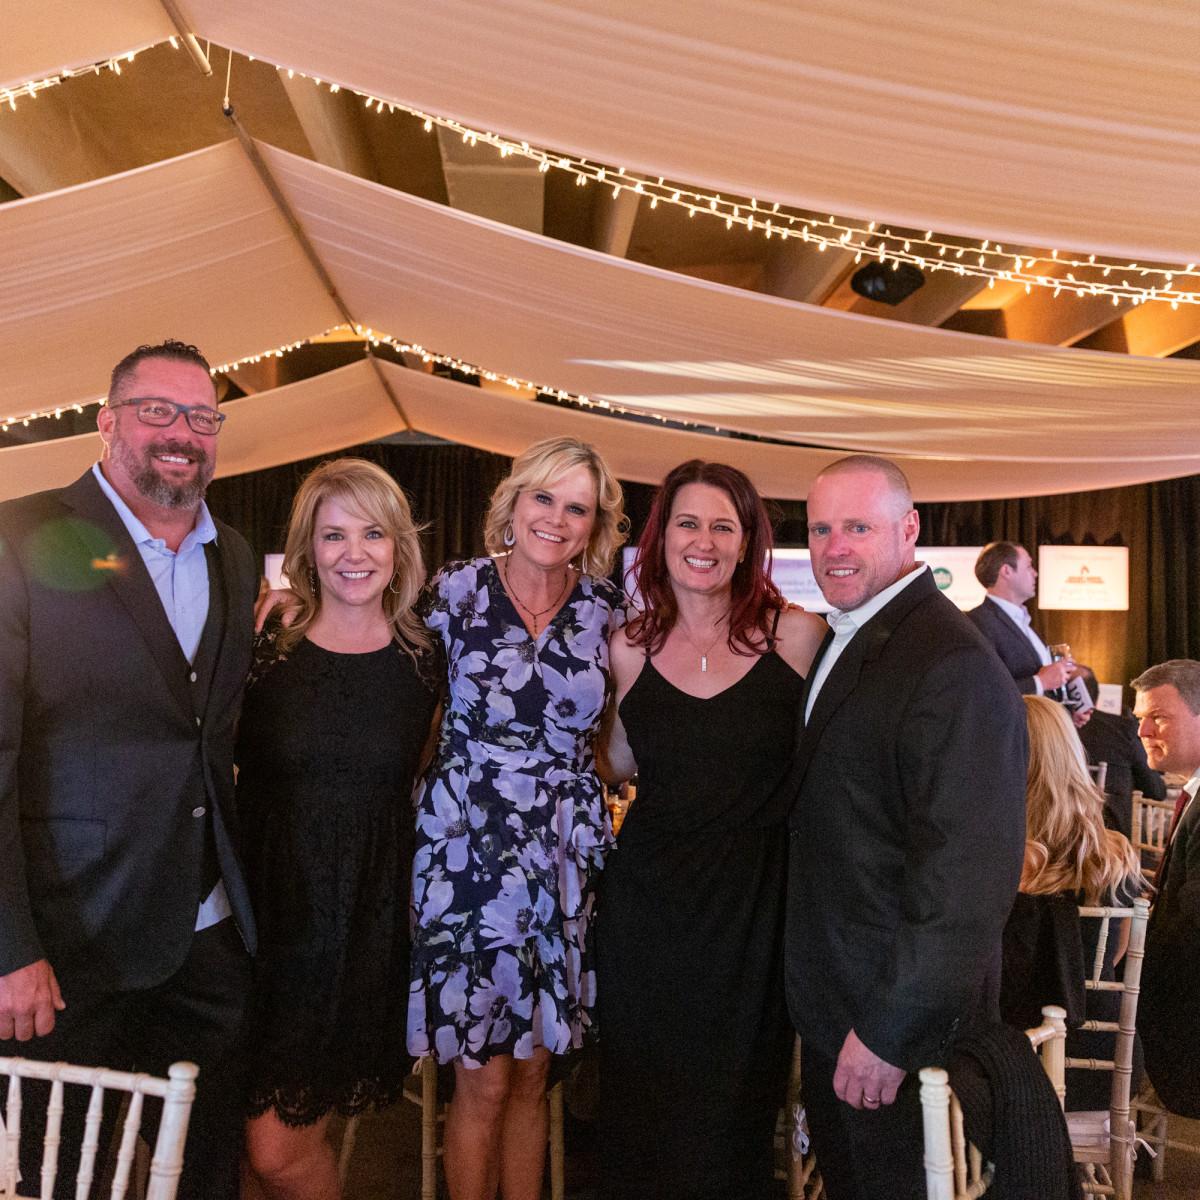 Doug & Katie Young, COVER 3, Kori Gough, Executive Director PFC, Kathy & Matt Dodson,